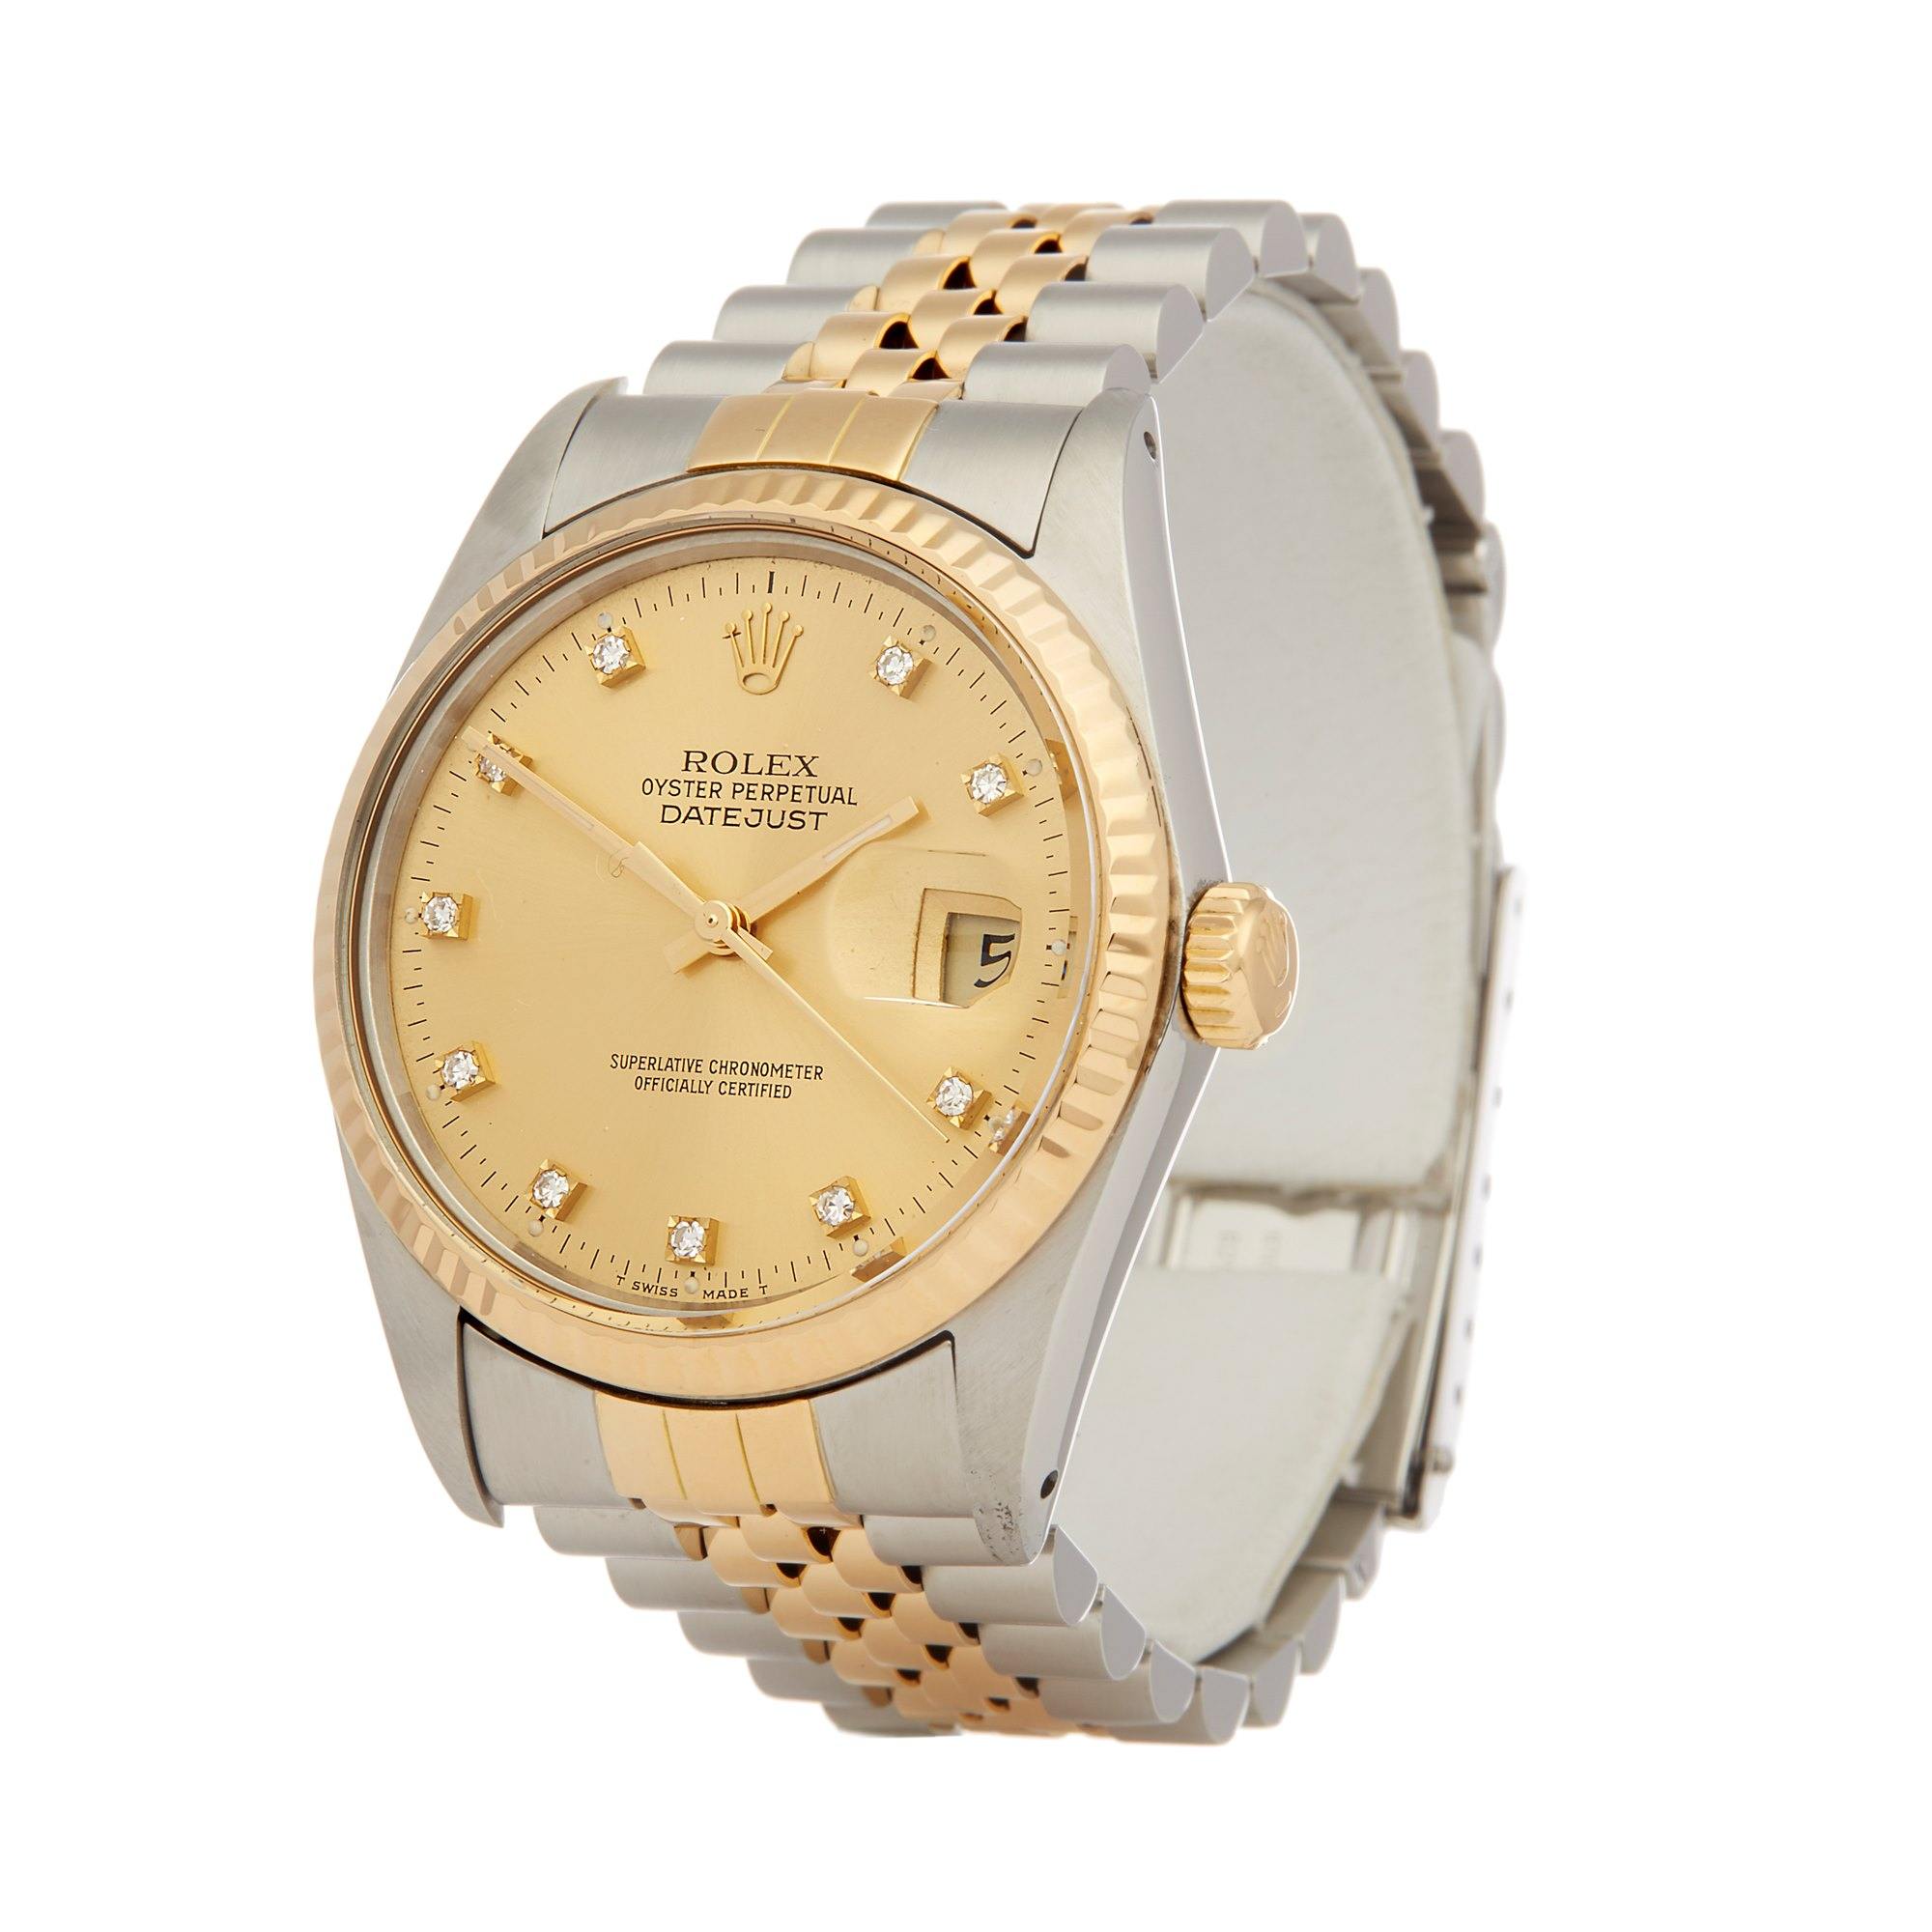 Rolex Datejust 36 Diamond Stainless Steel & Yellow Gold 16013G